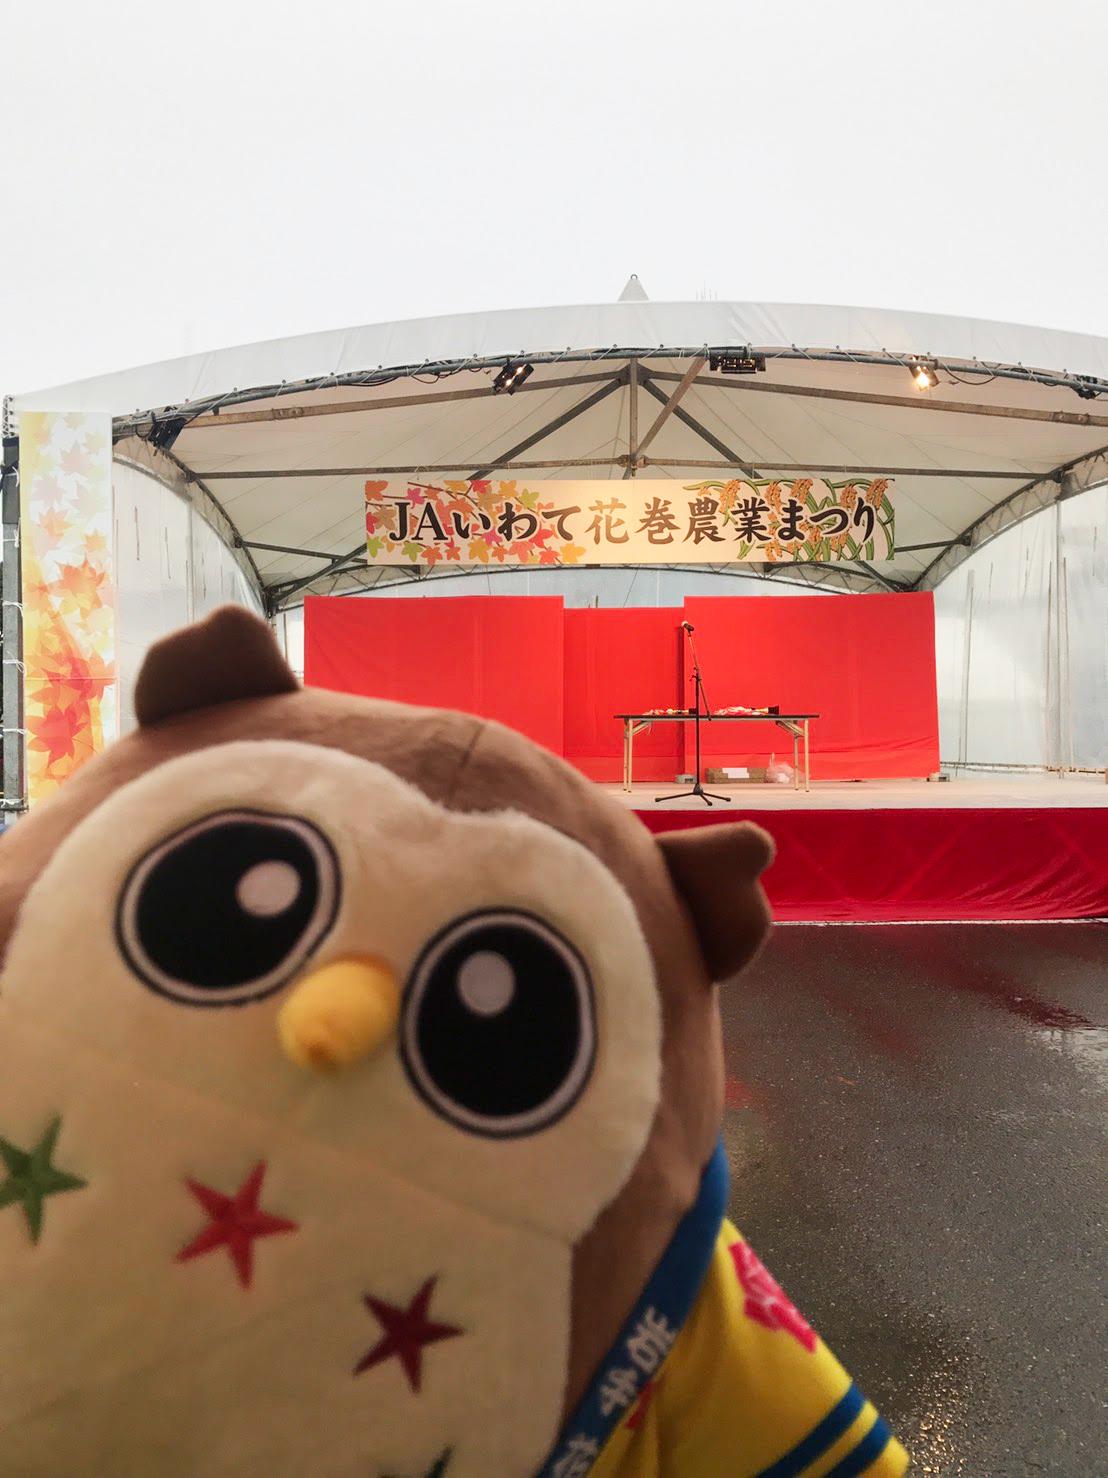 20171022_JAいわて花巻 農業まつり�@.jpg